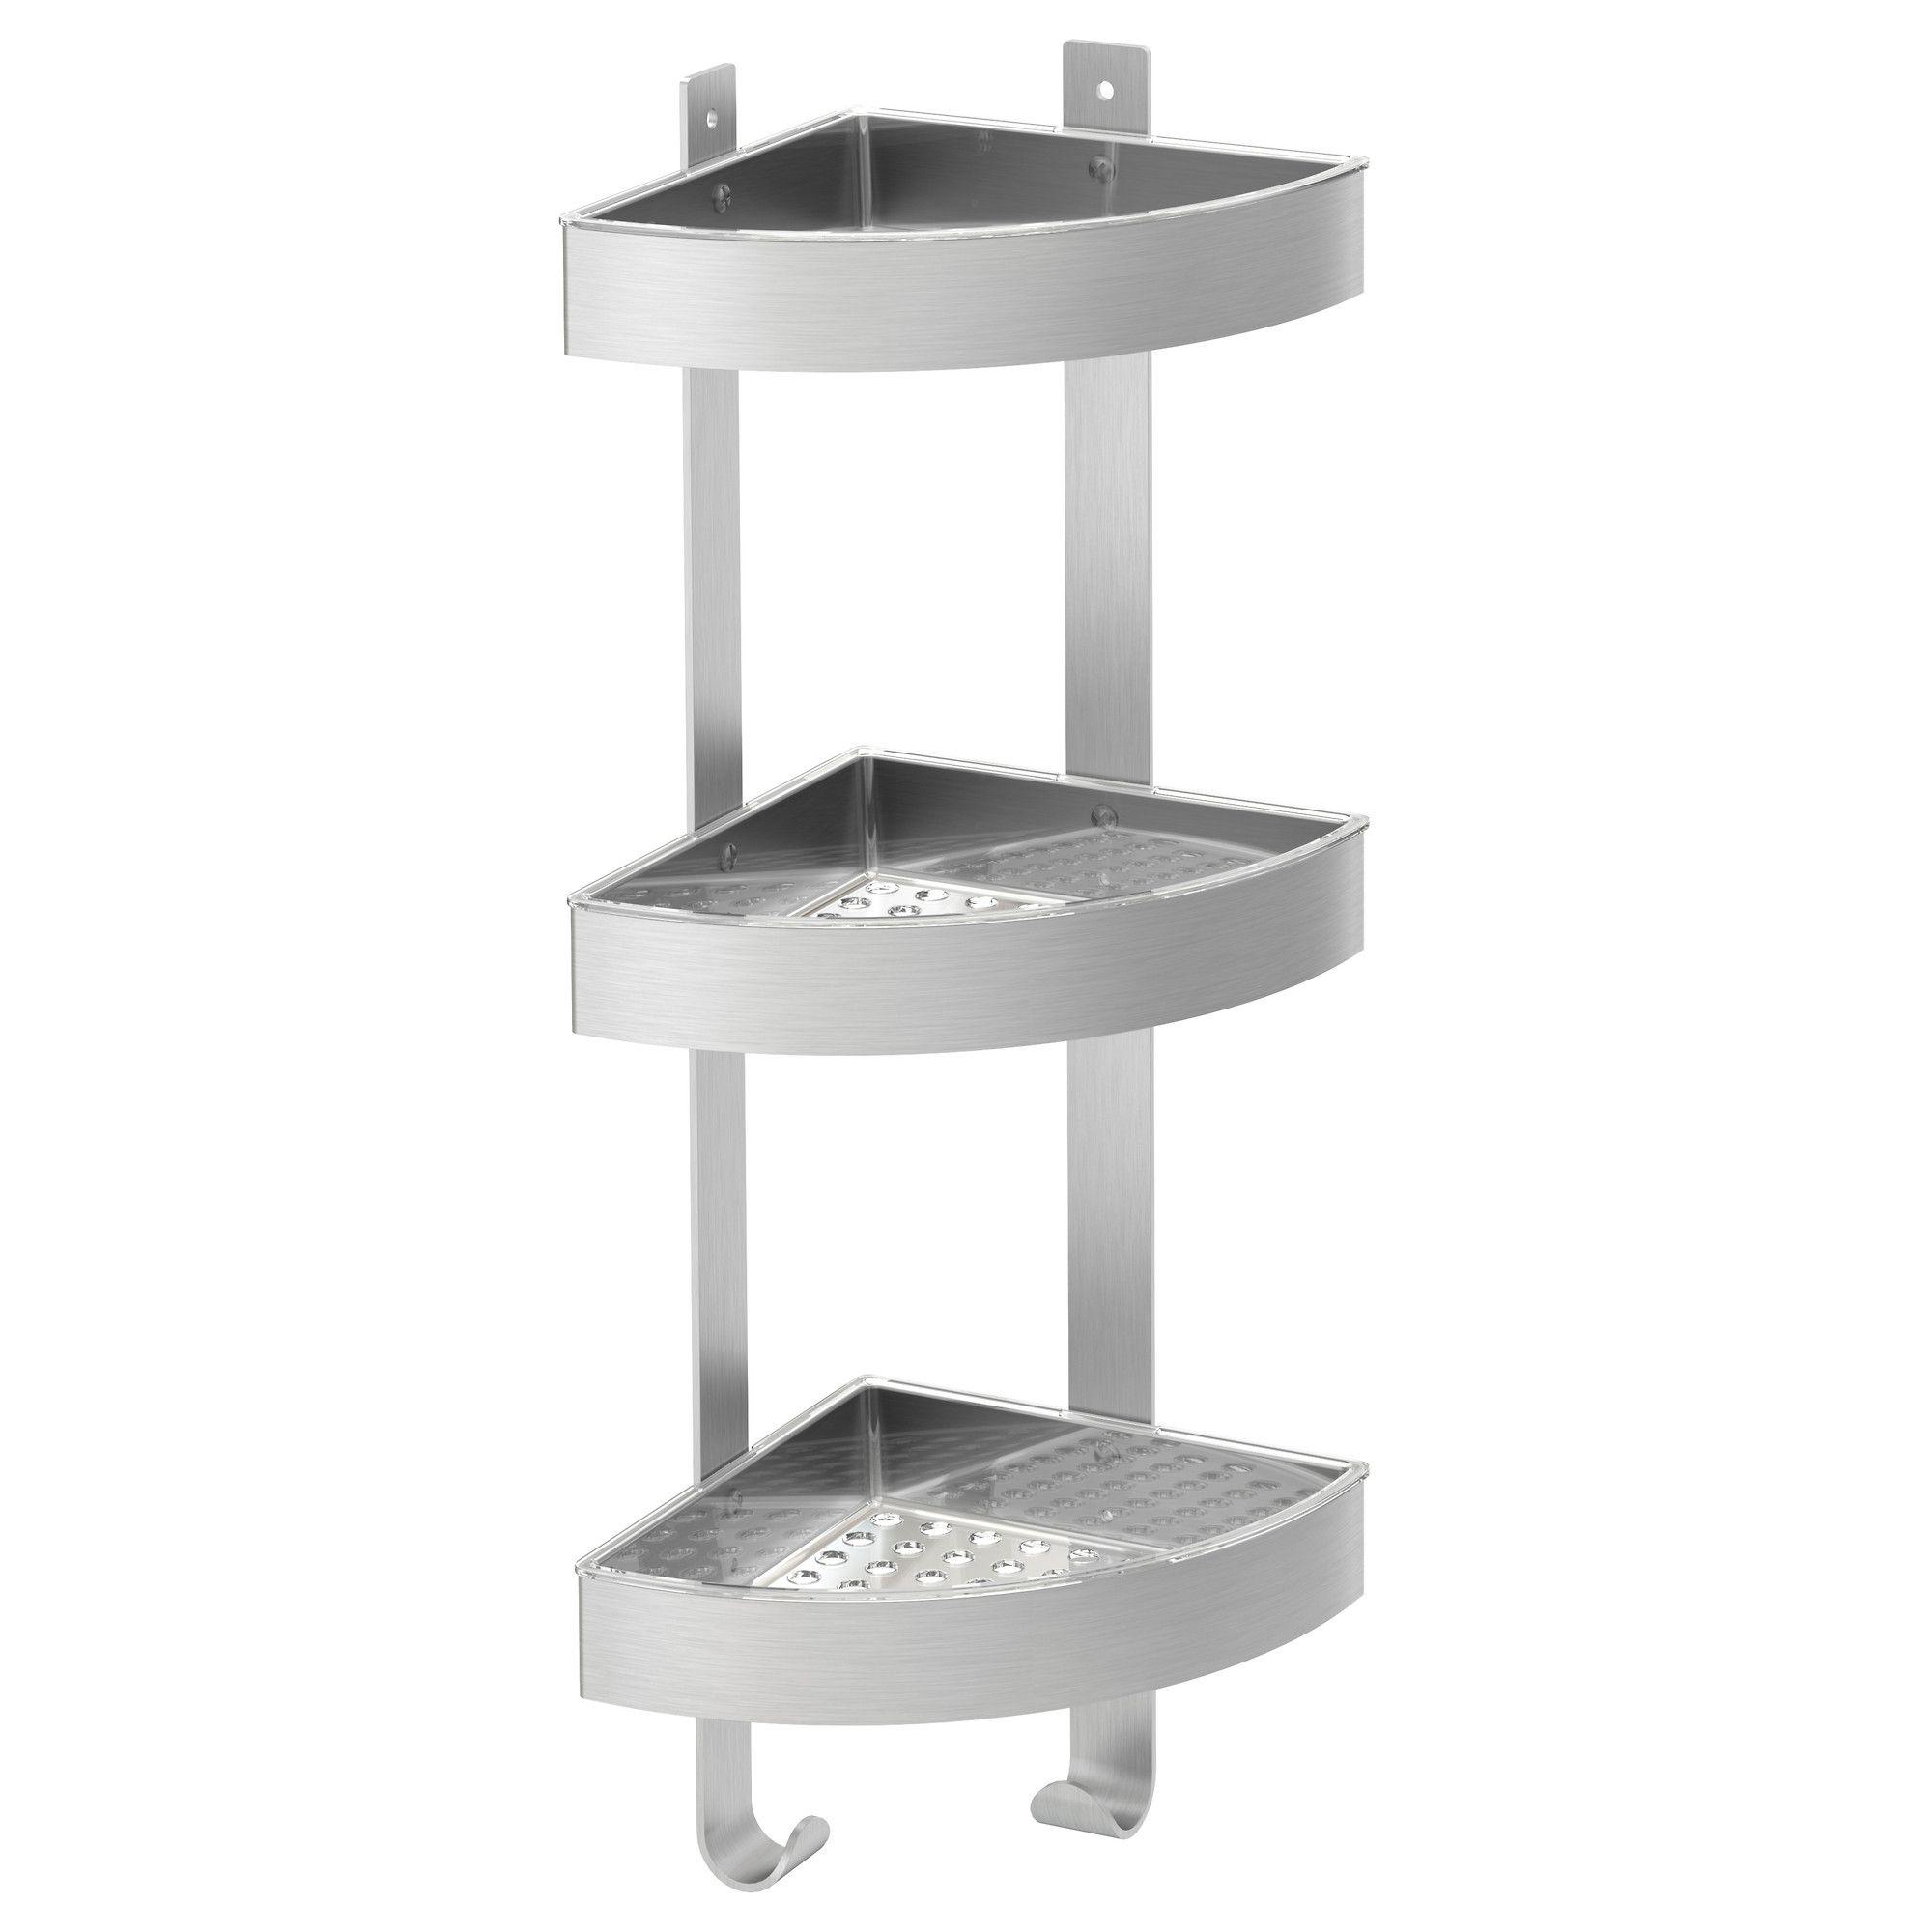 grundtal corner wall shelf unit stainless steel wall shelf unit